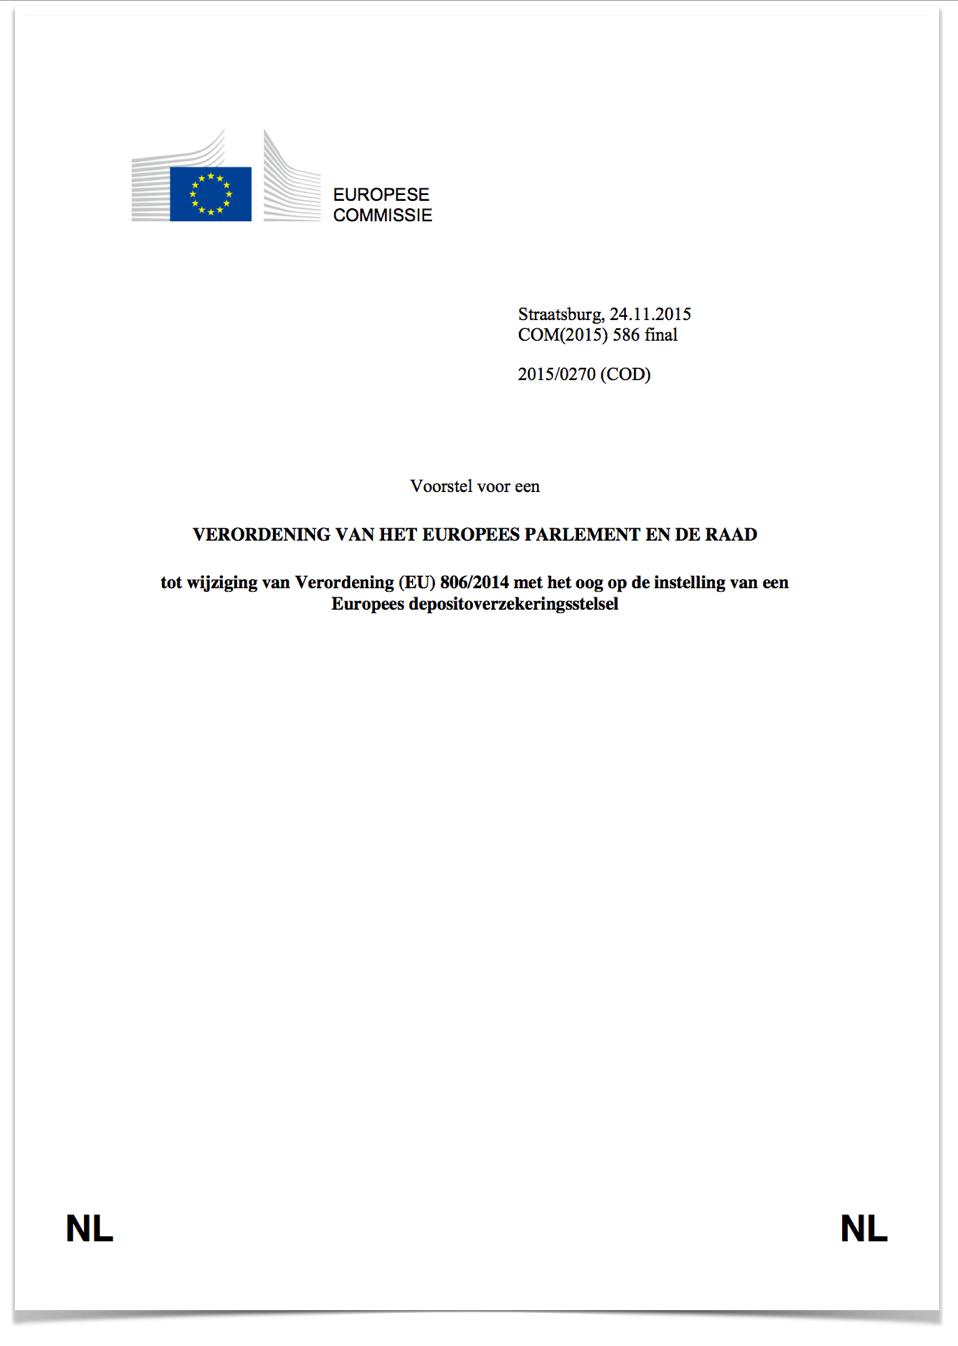 [26] Voorstel Europees depositoverzekering stelselVoorstel Europees depositoverzekering stelsel